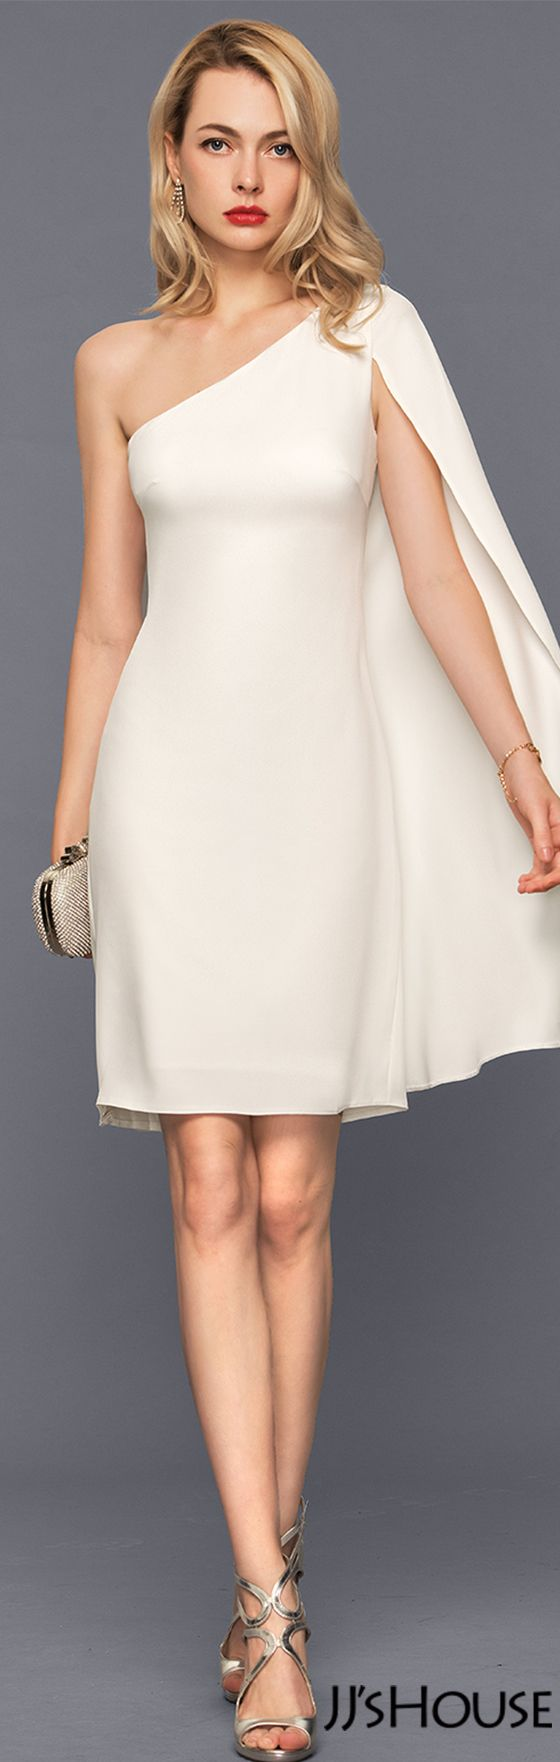 Sheath/Column One-Shoulder Knee-Length Satin Cocktail Dress#JJsHouse #Cocktail dresses